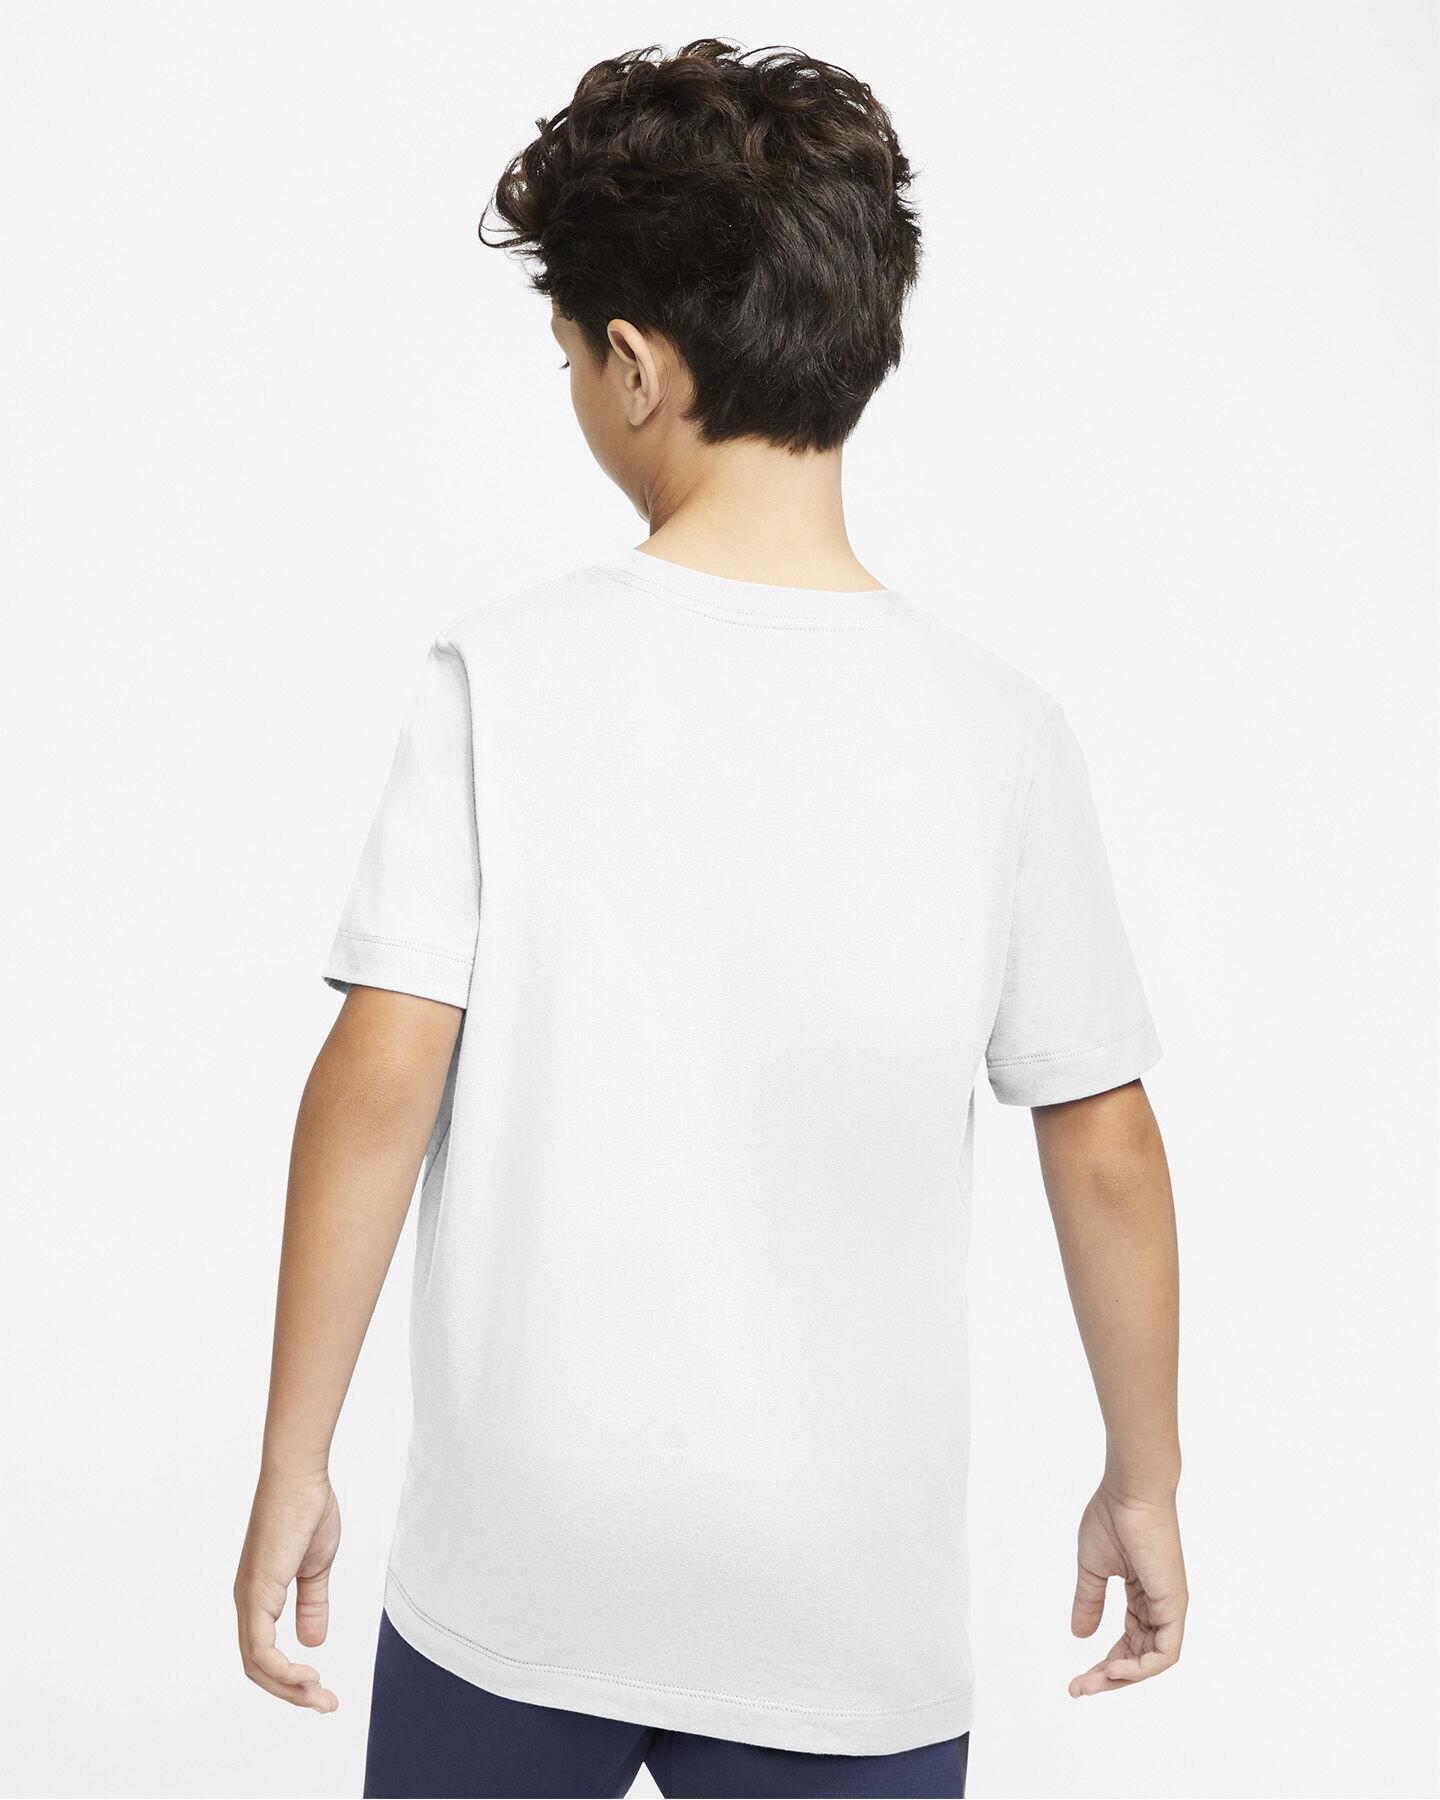 T-Shirt NIKE FUTURA JR S5197420 scatto 3